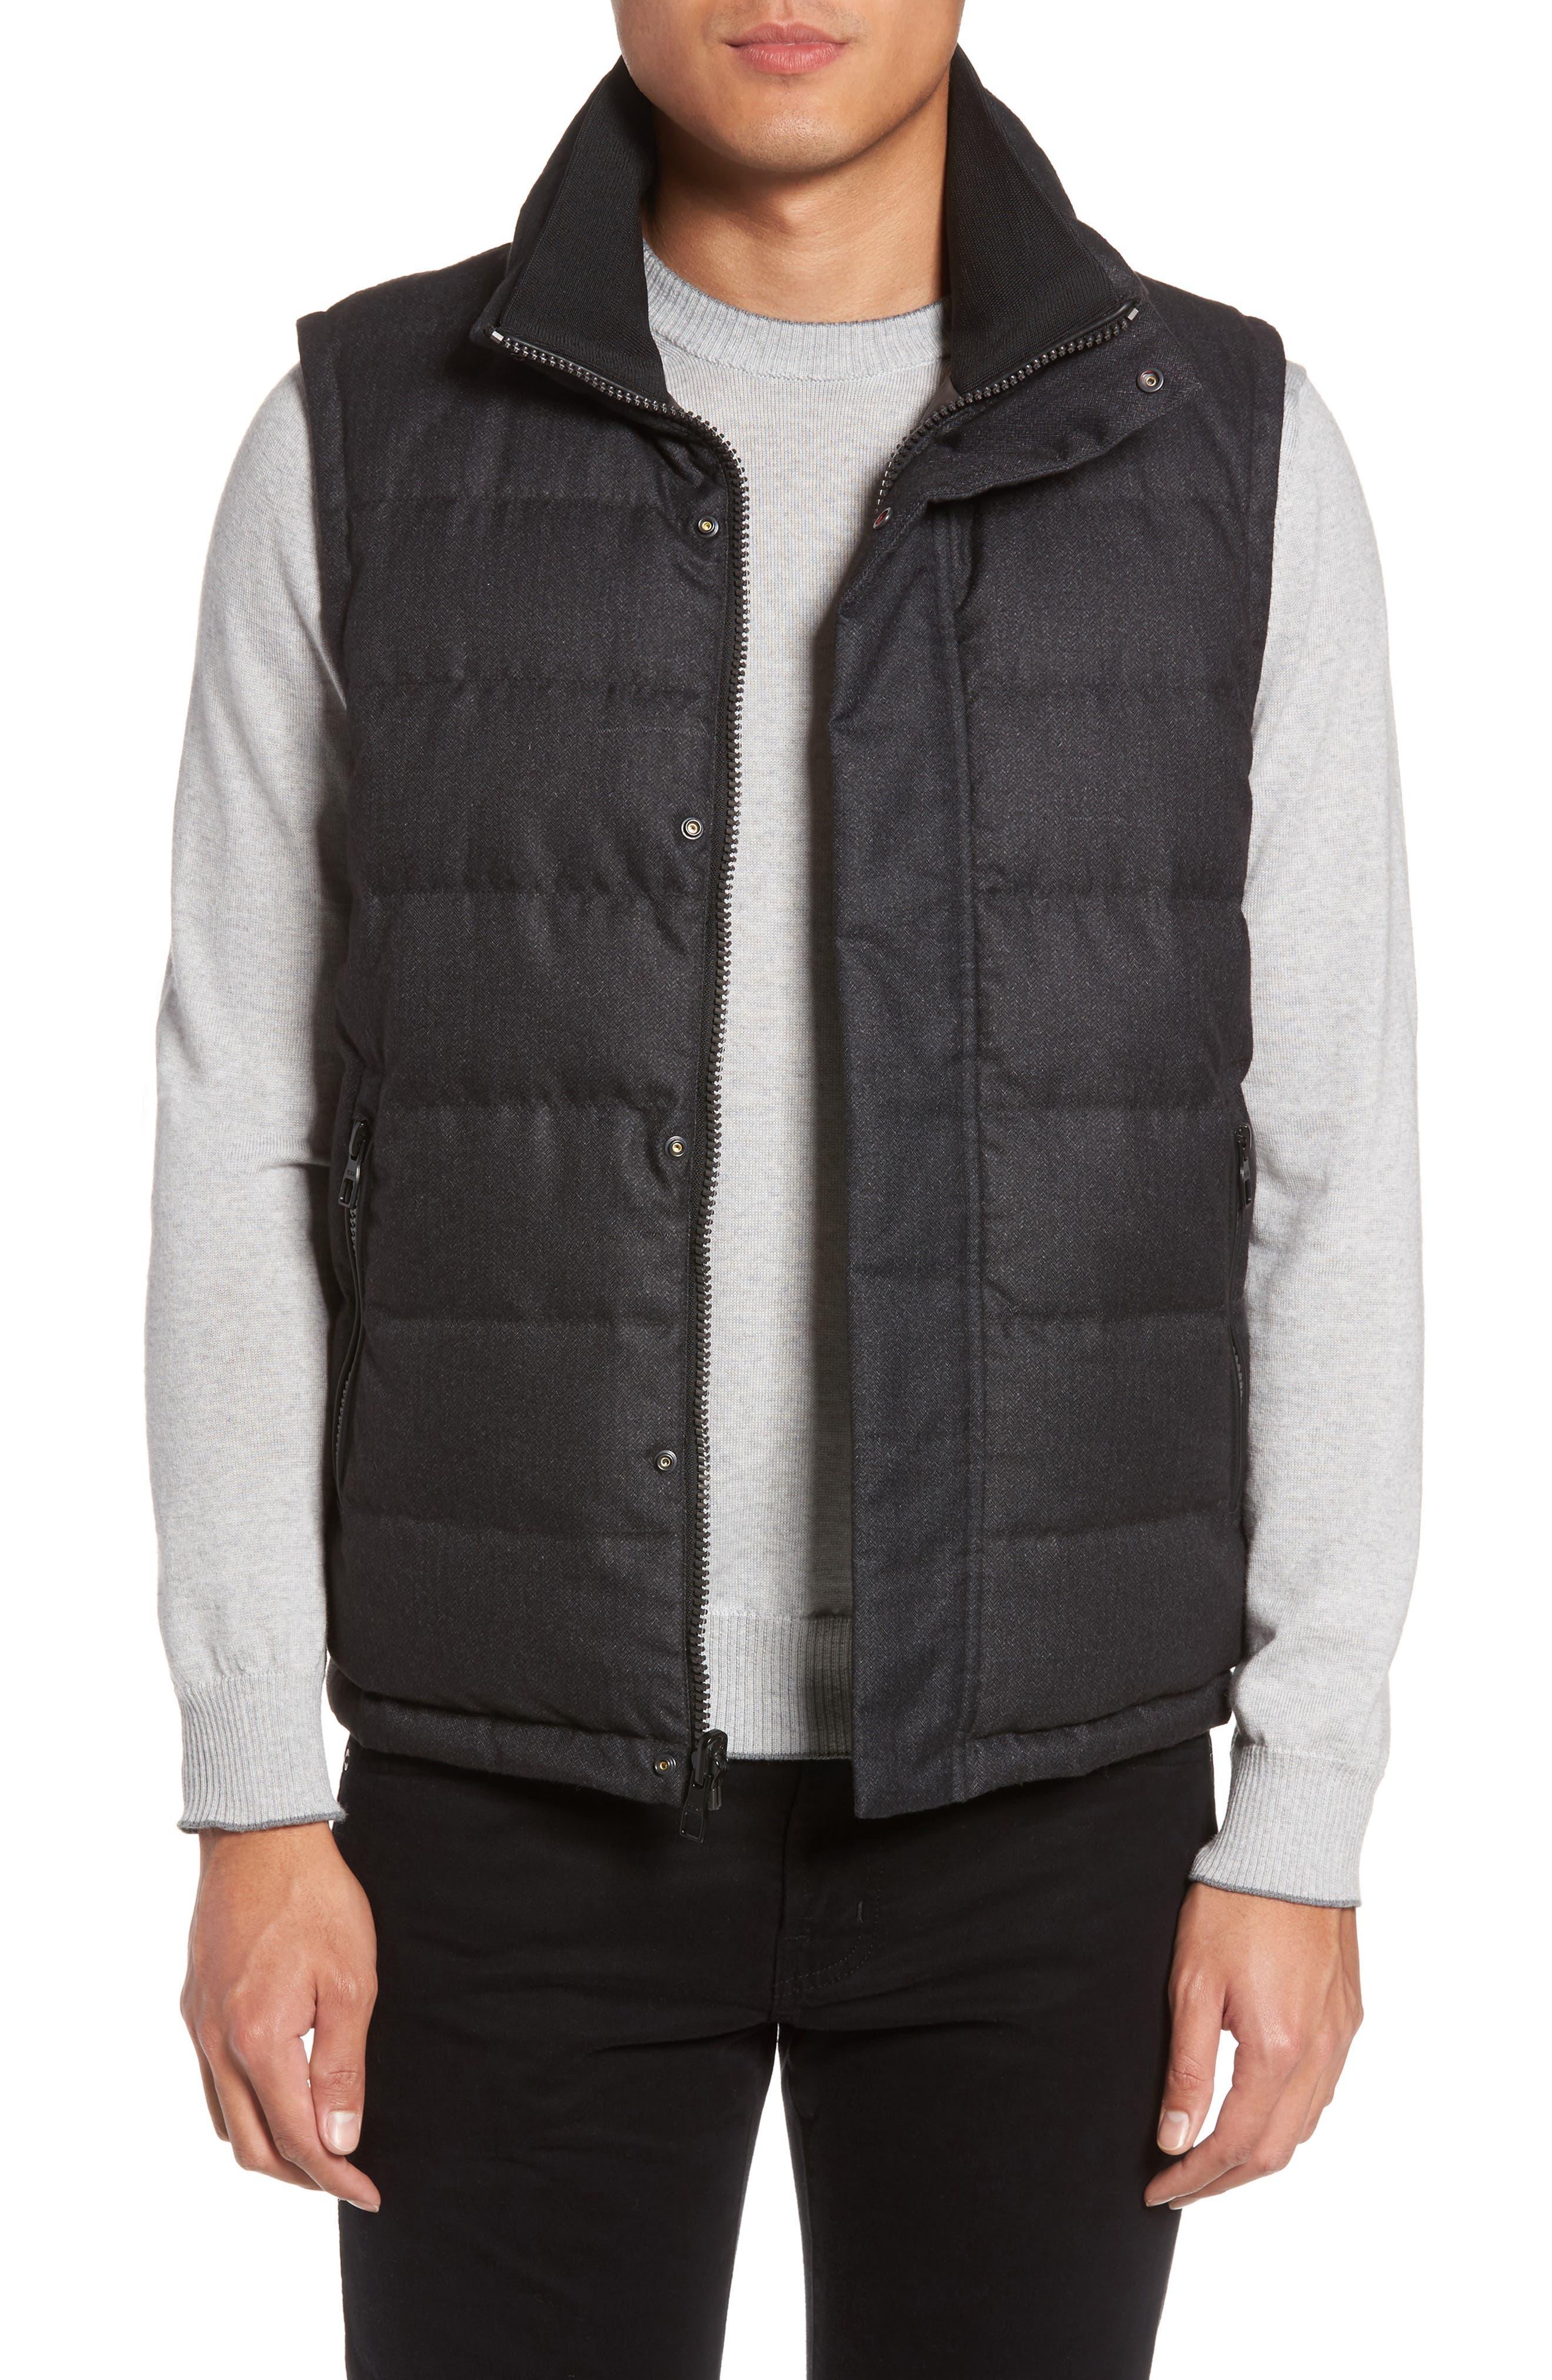 Alternate Image 1 Selected - Tumi Heritage Reversible Down Vest